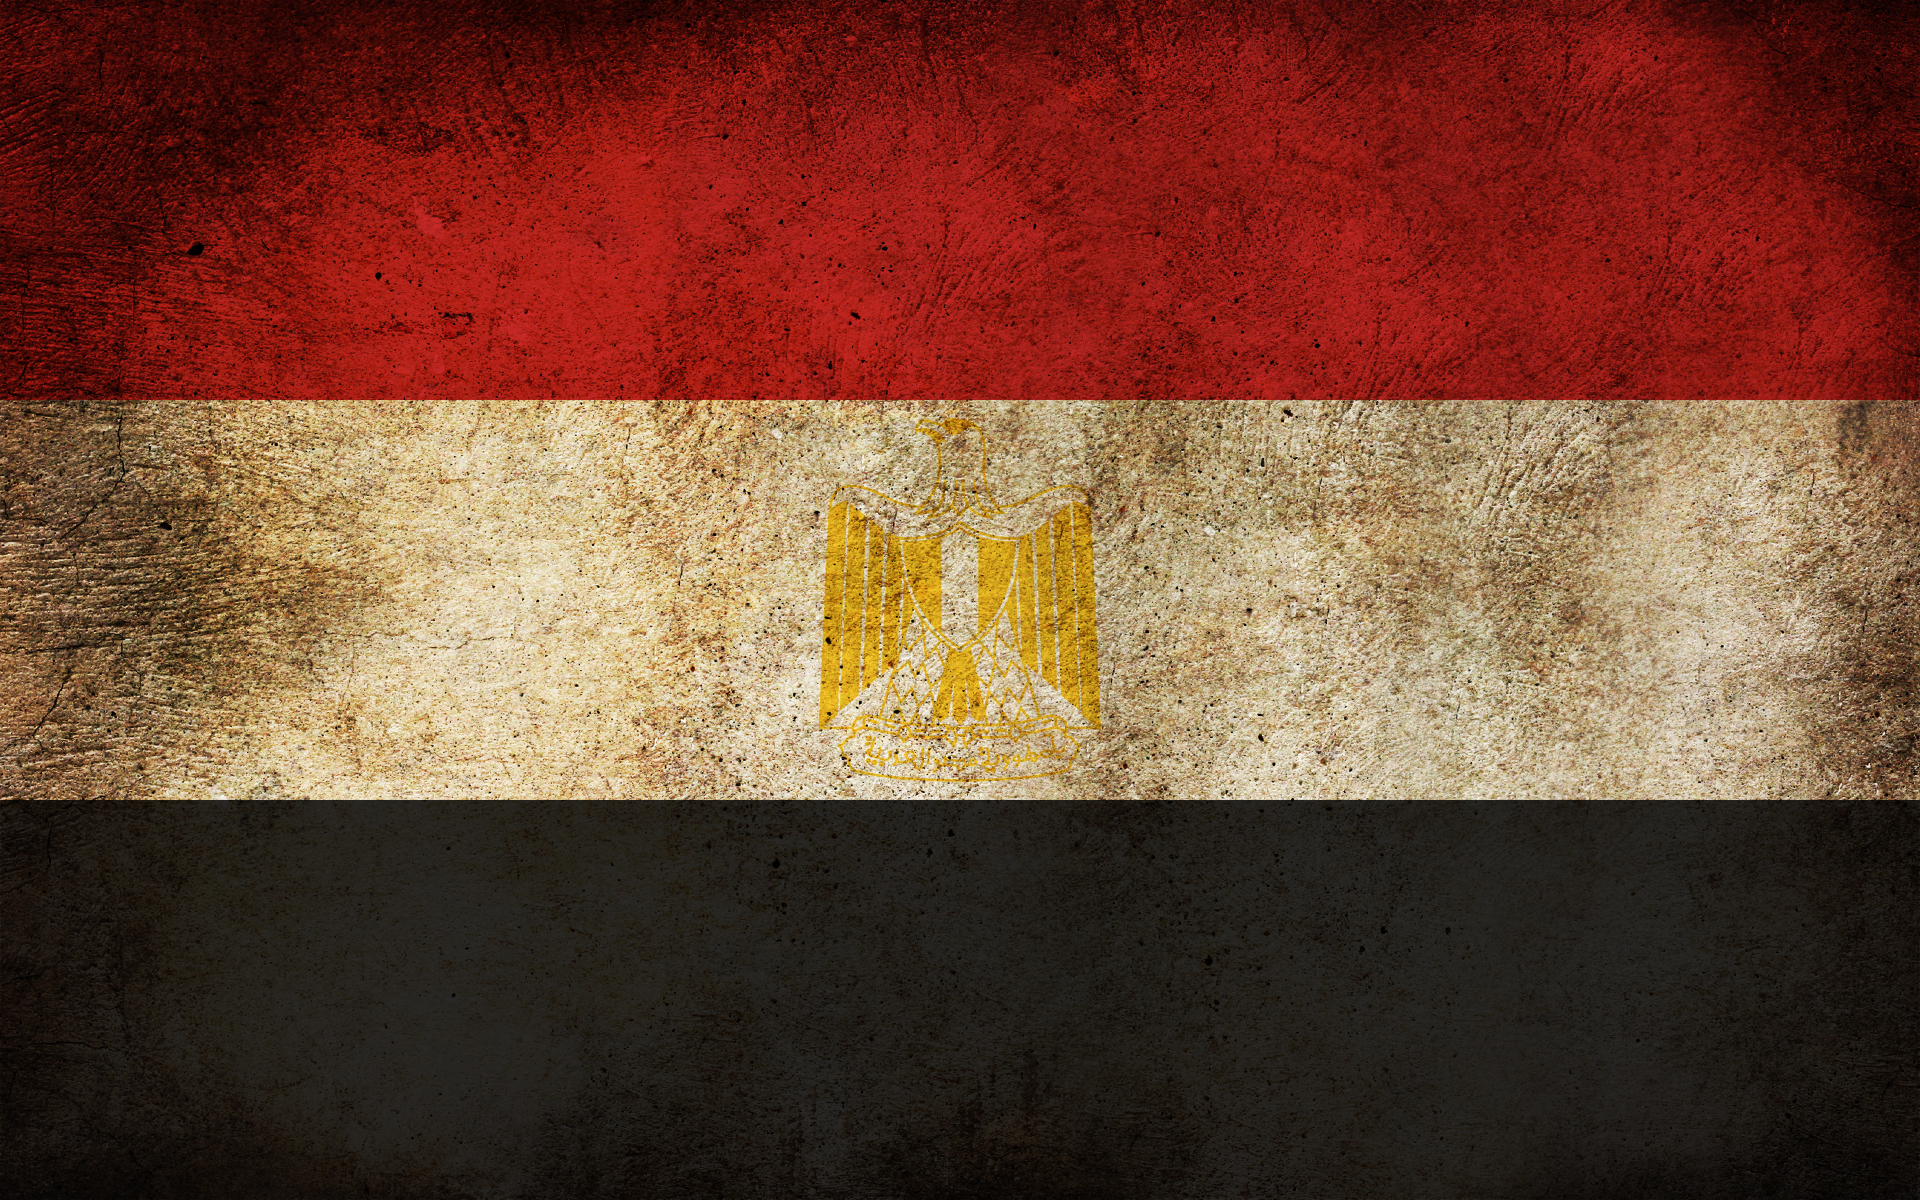 صور علم مصر , صور اعلام مصرية 2014